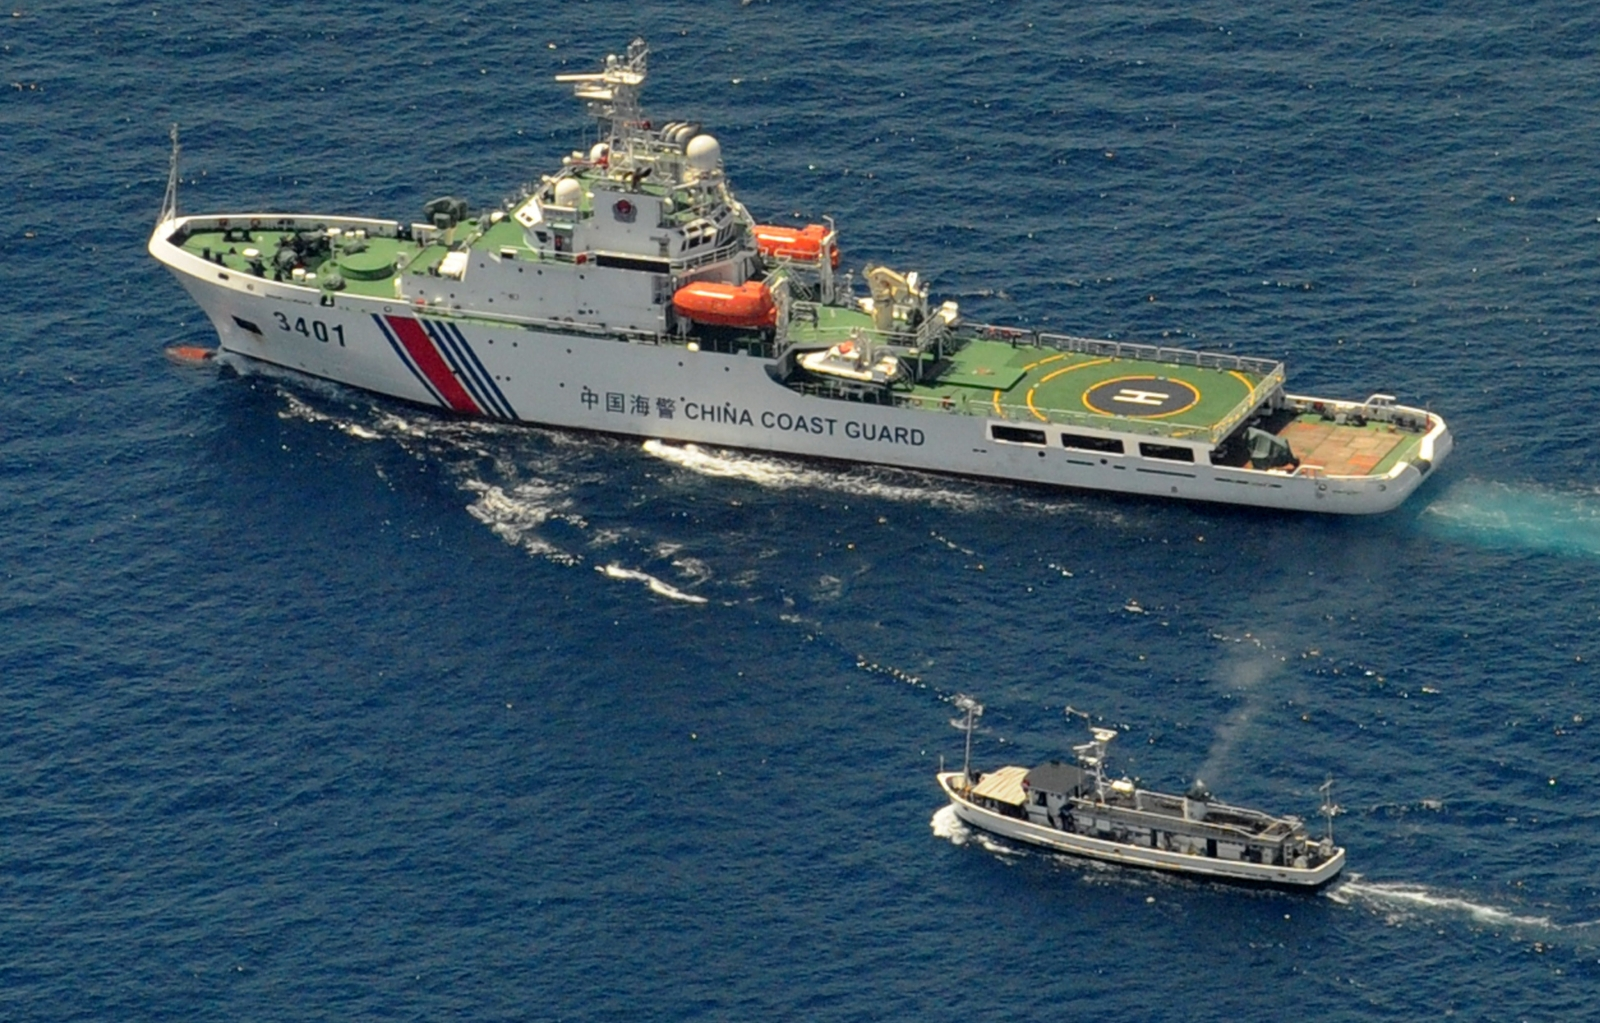 South China Sea confrontation